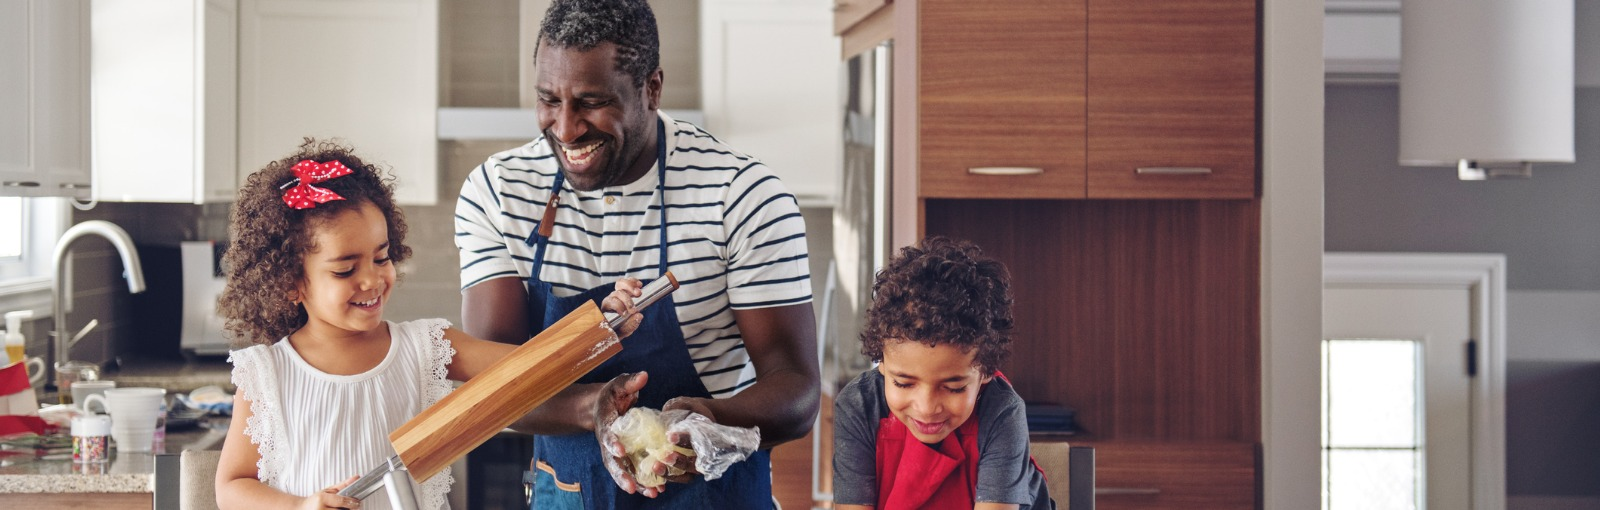 family-in-kitchen.jpg